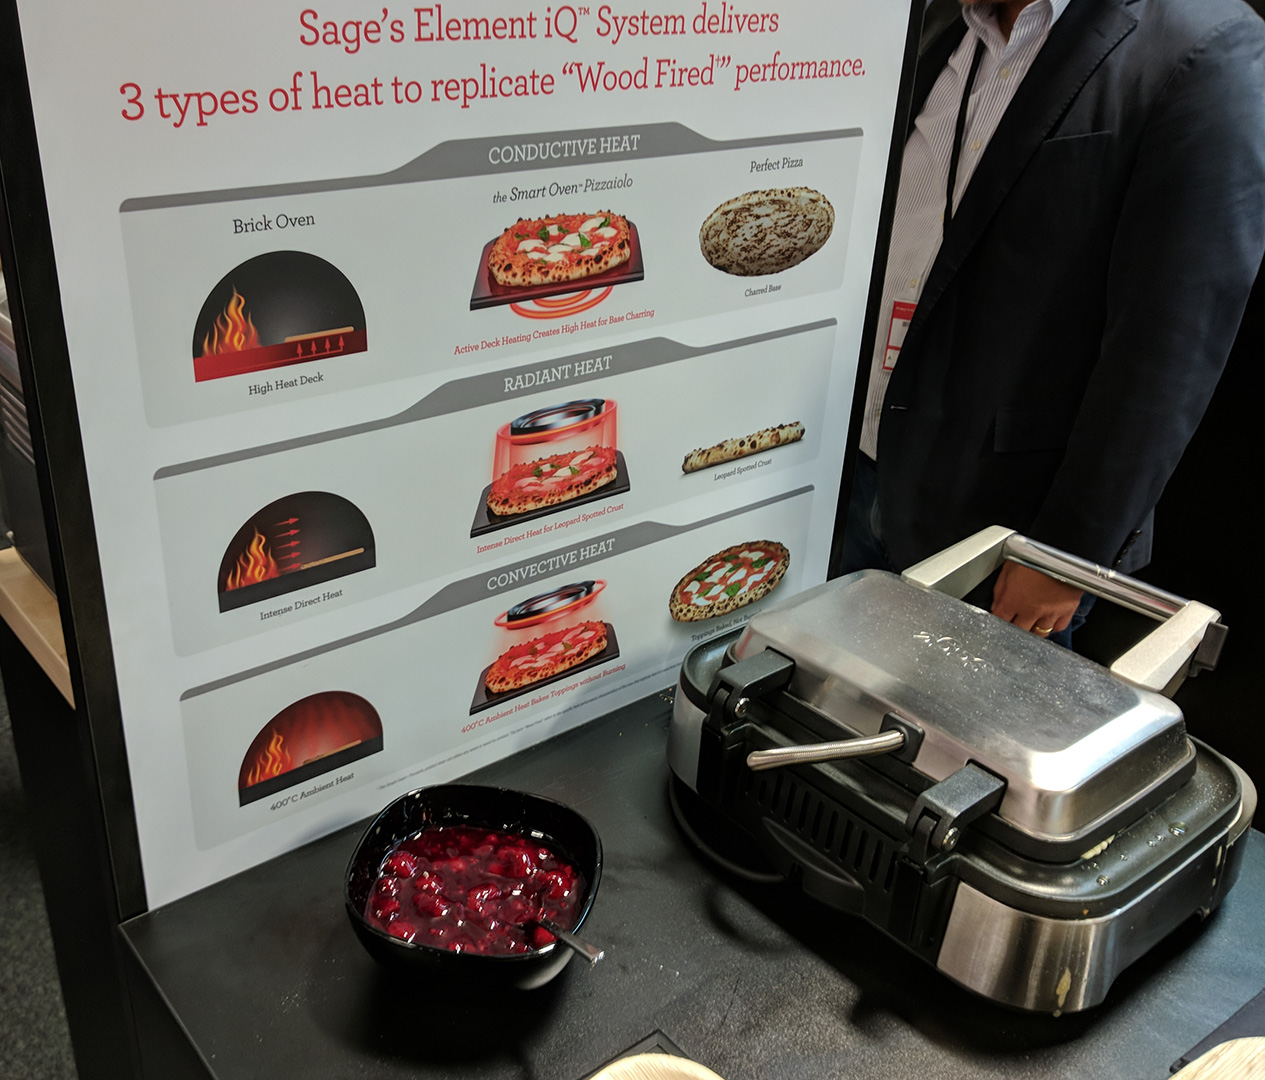 Sage's Element iQ System - Waffelofen